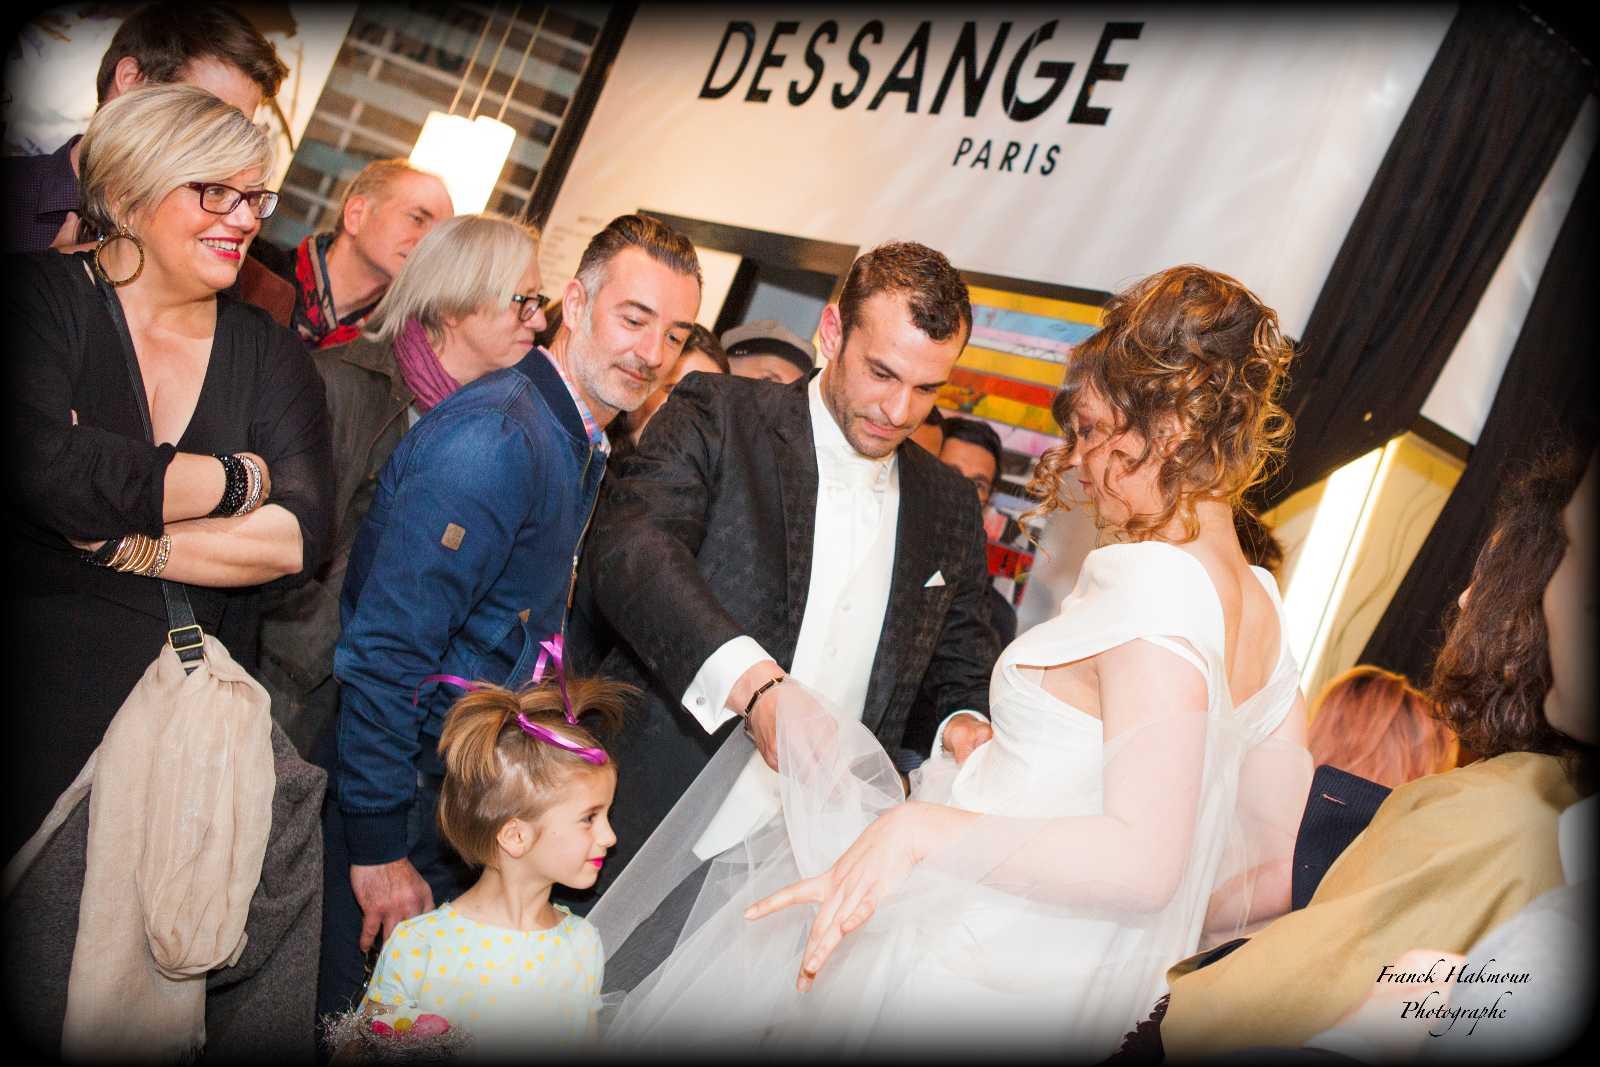 Dessange Franck Hakmoun Photographe (43)